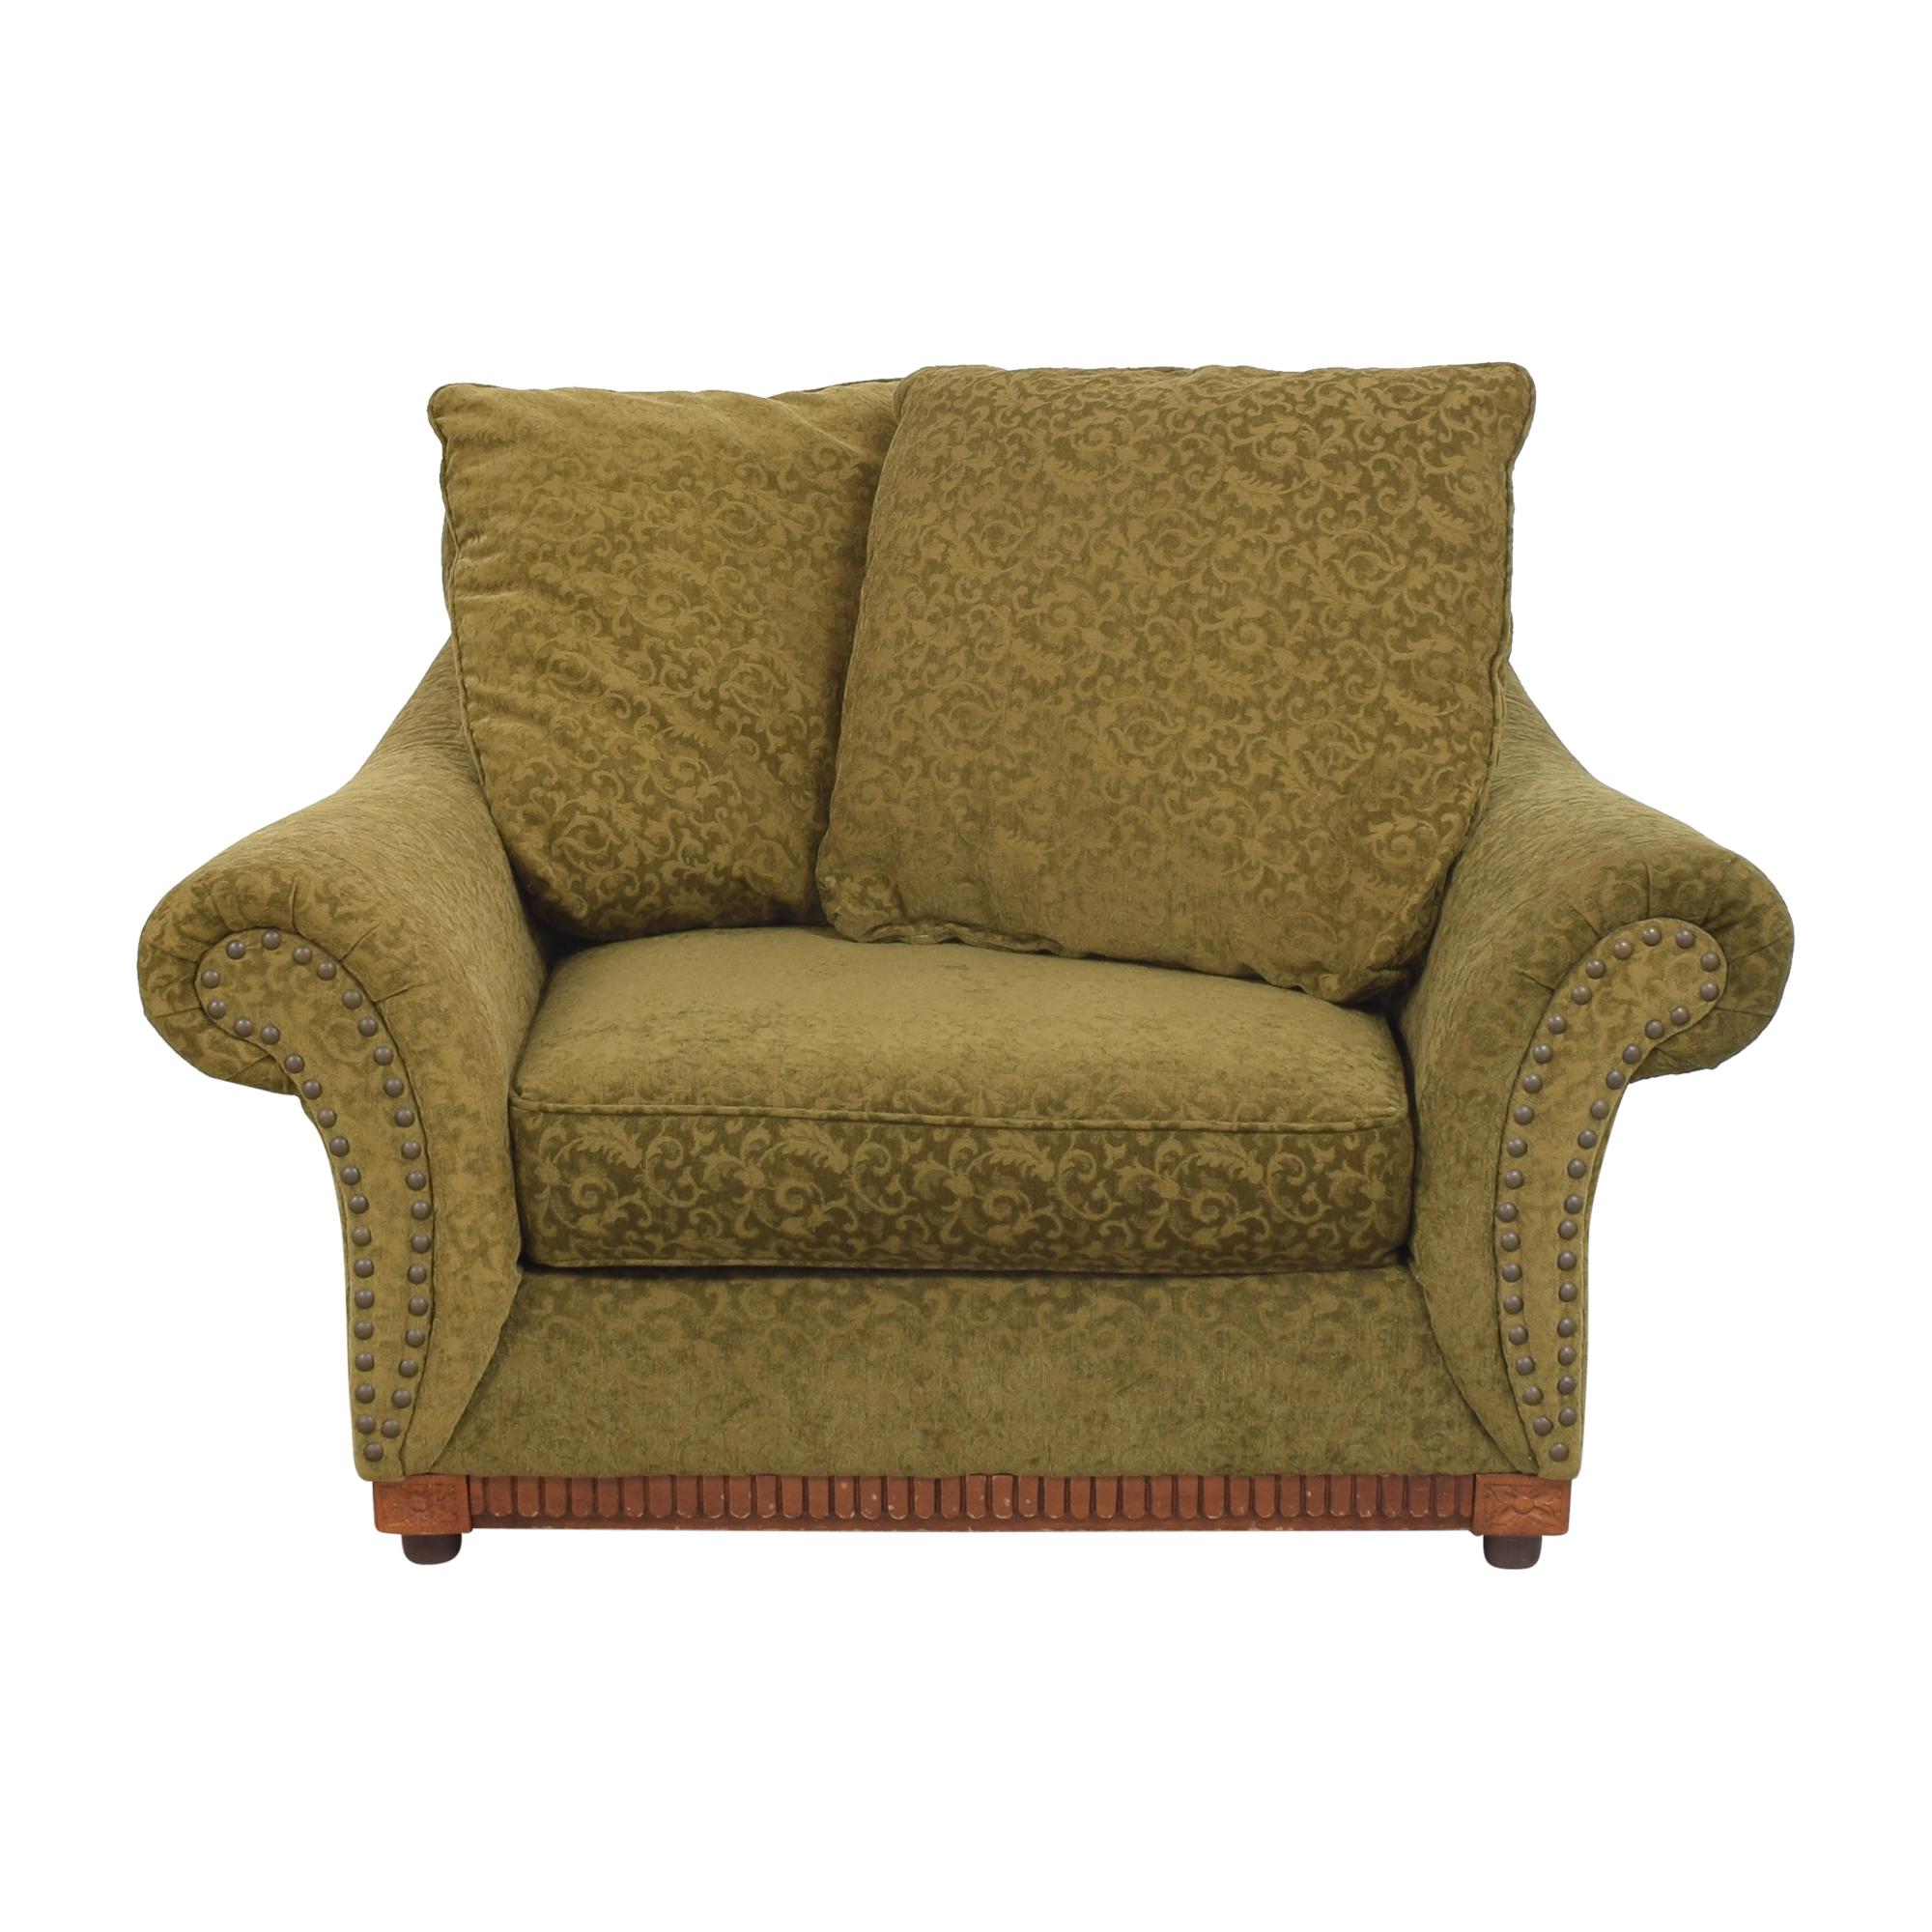 Bauhaus Furniture Bauhaus Accent Armchair price